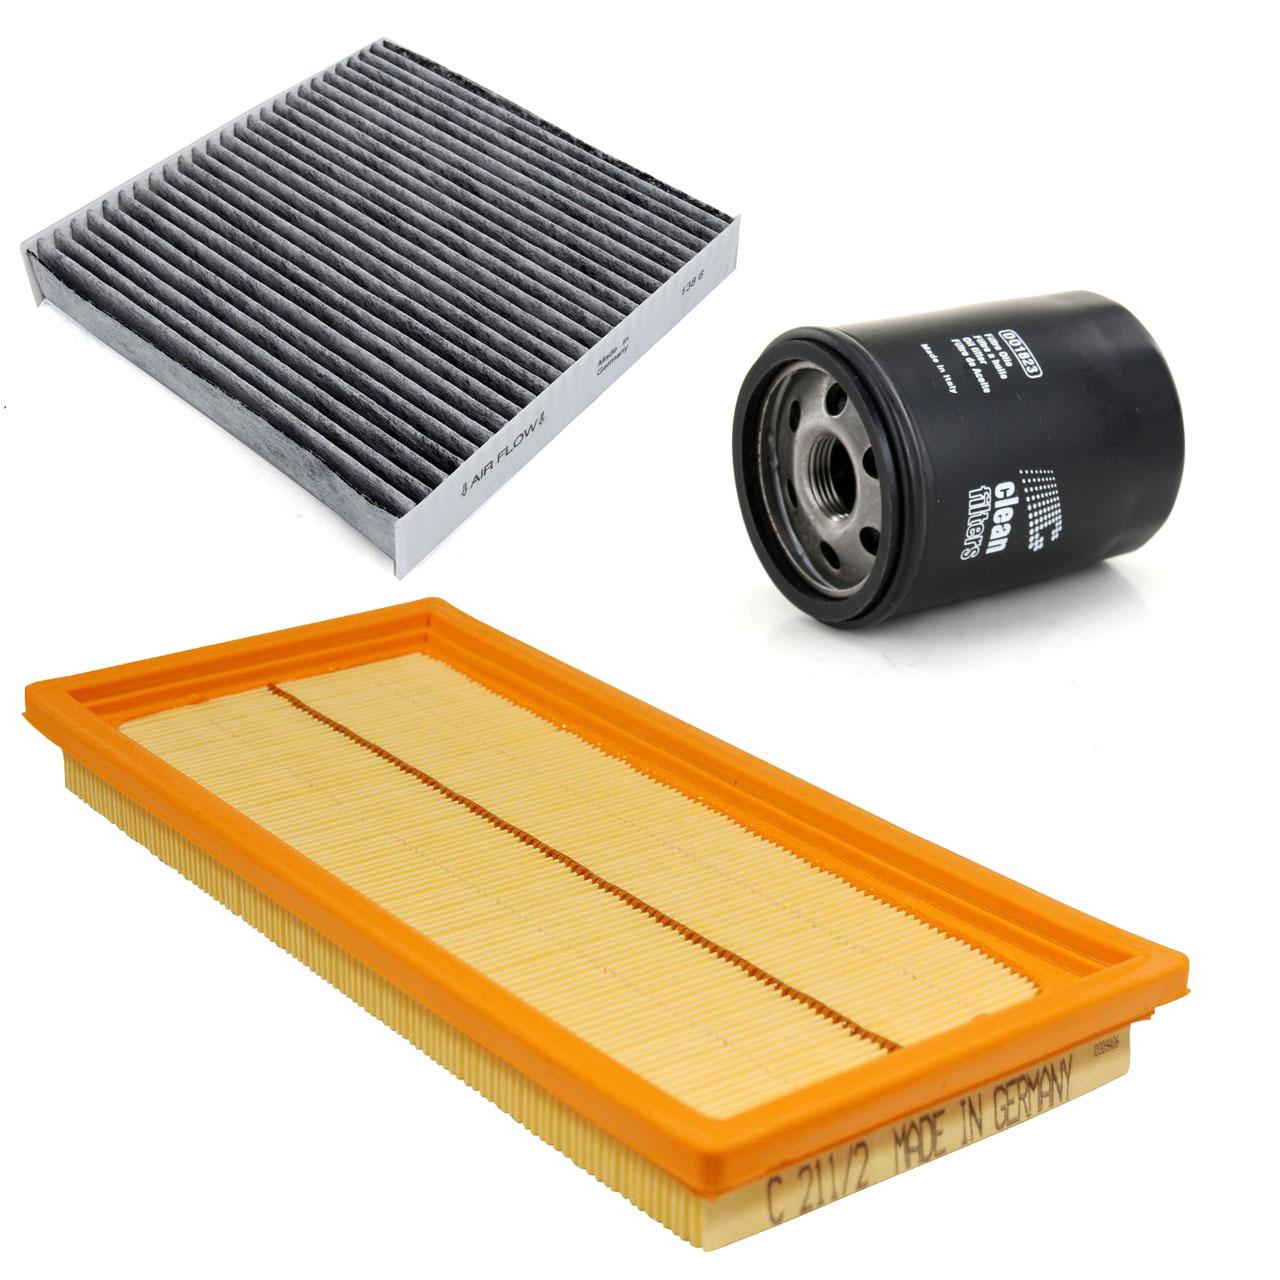 Inspektionskit Filterpaket Filterset für Fiat 500 / C (312) 1.4 100PS ab 11.2012